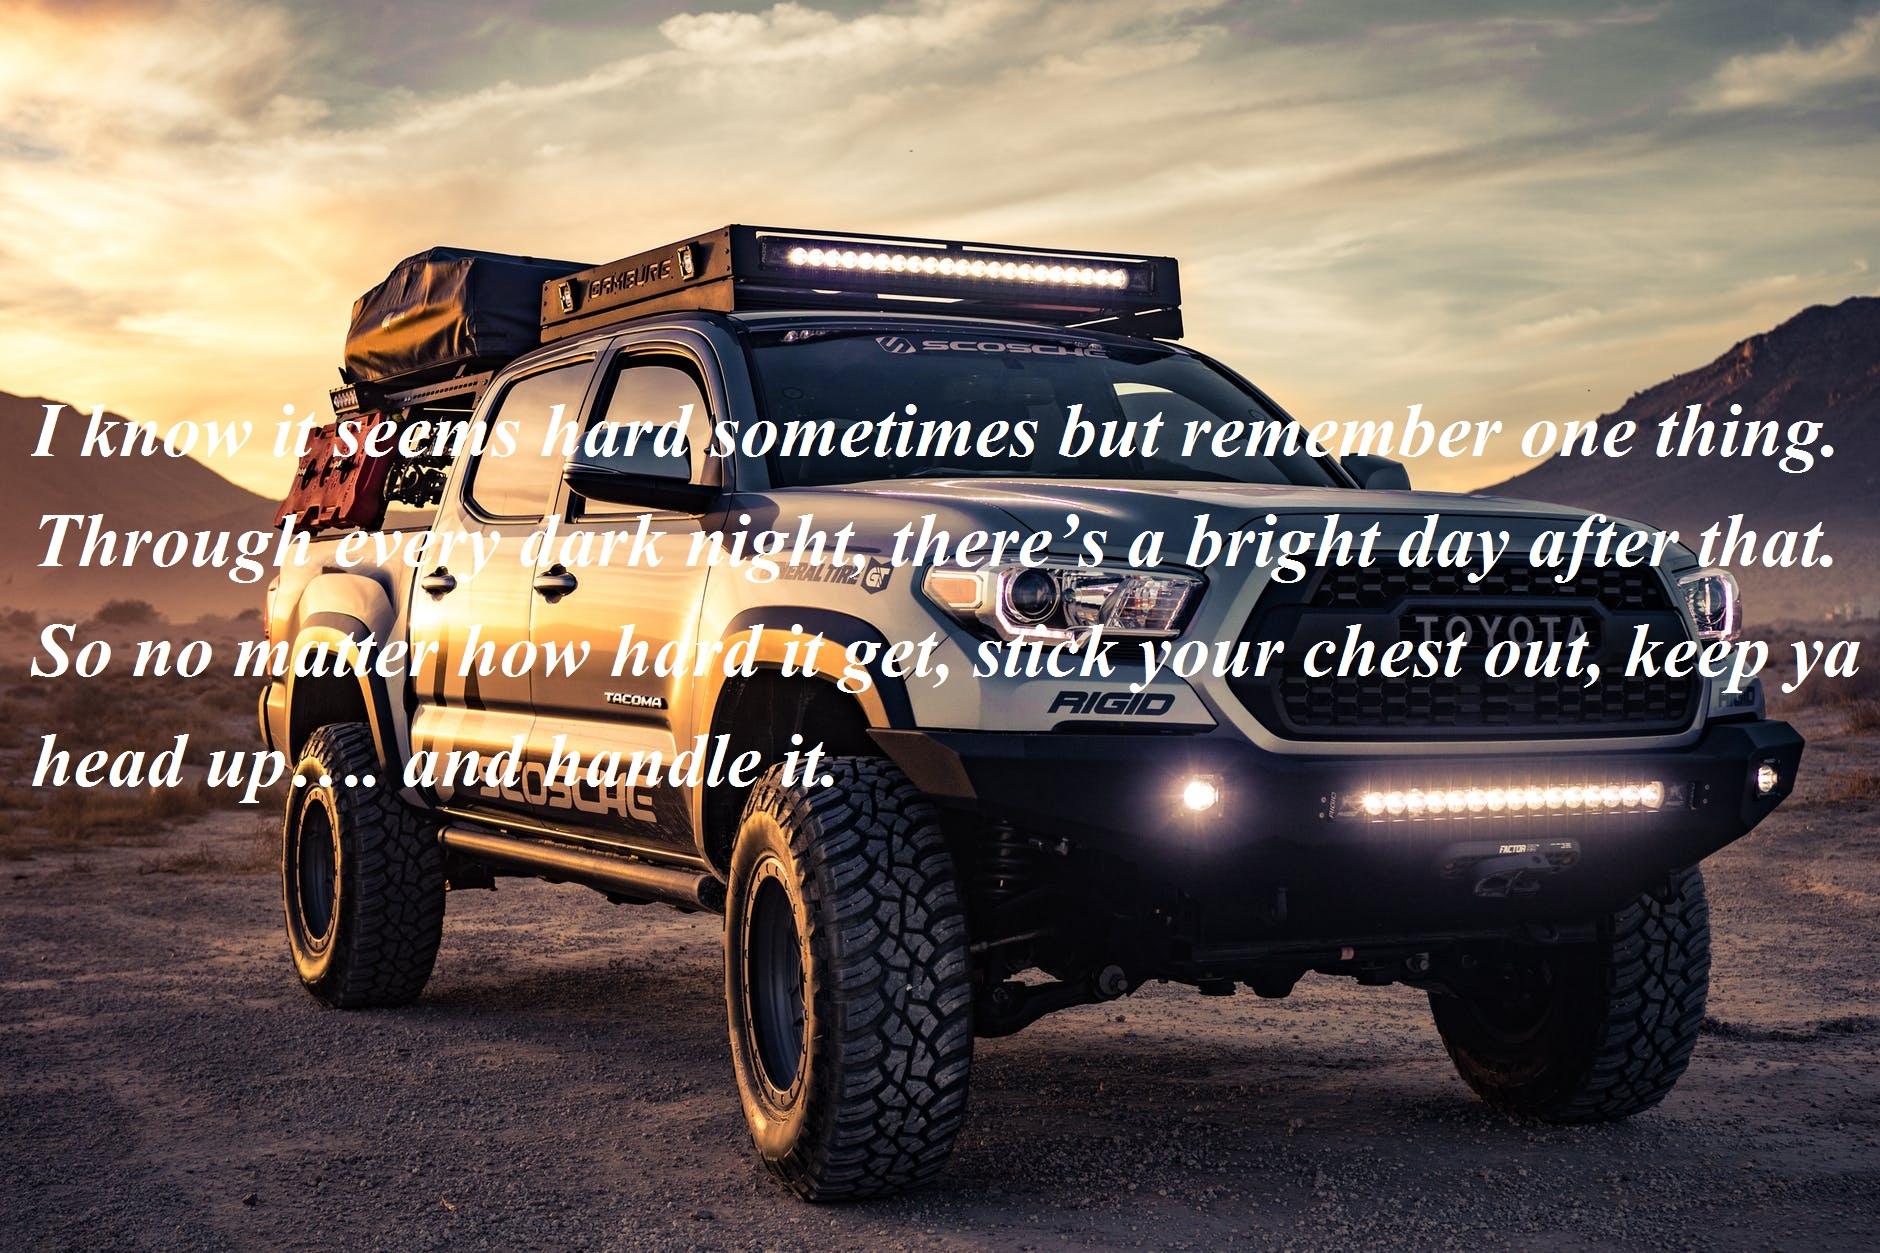 future is bright quotes